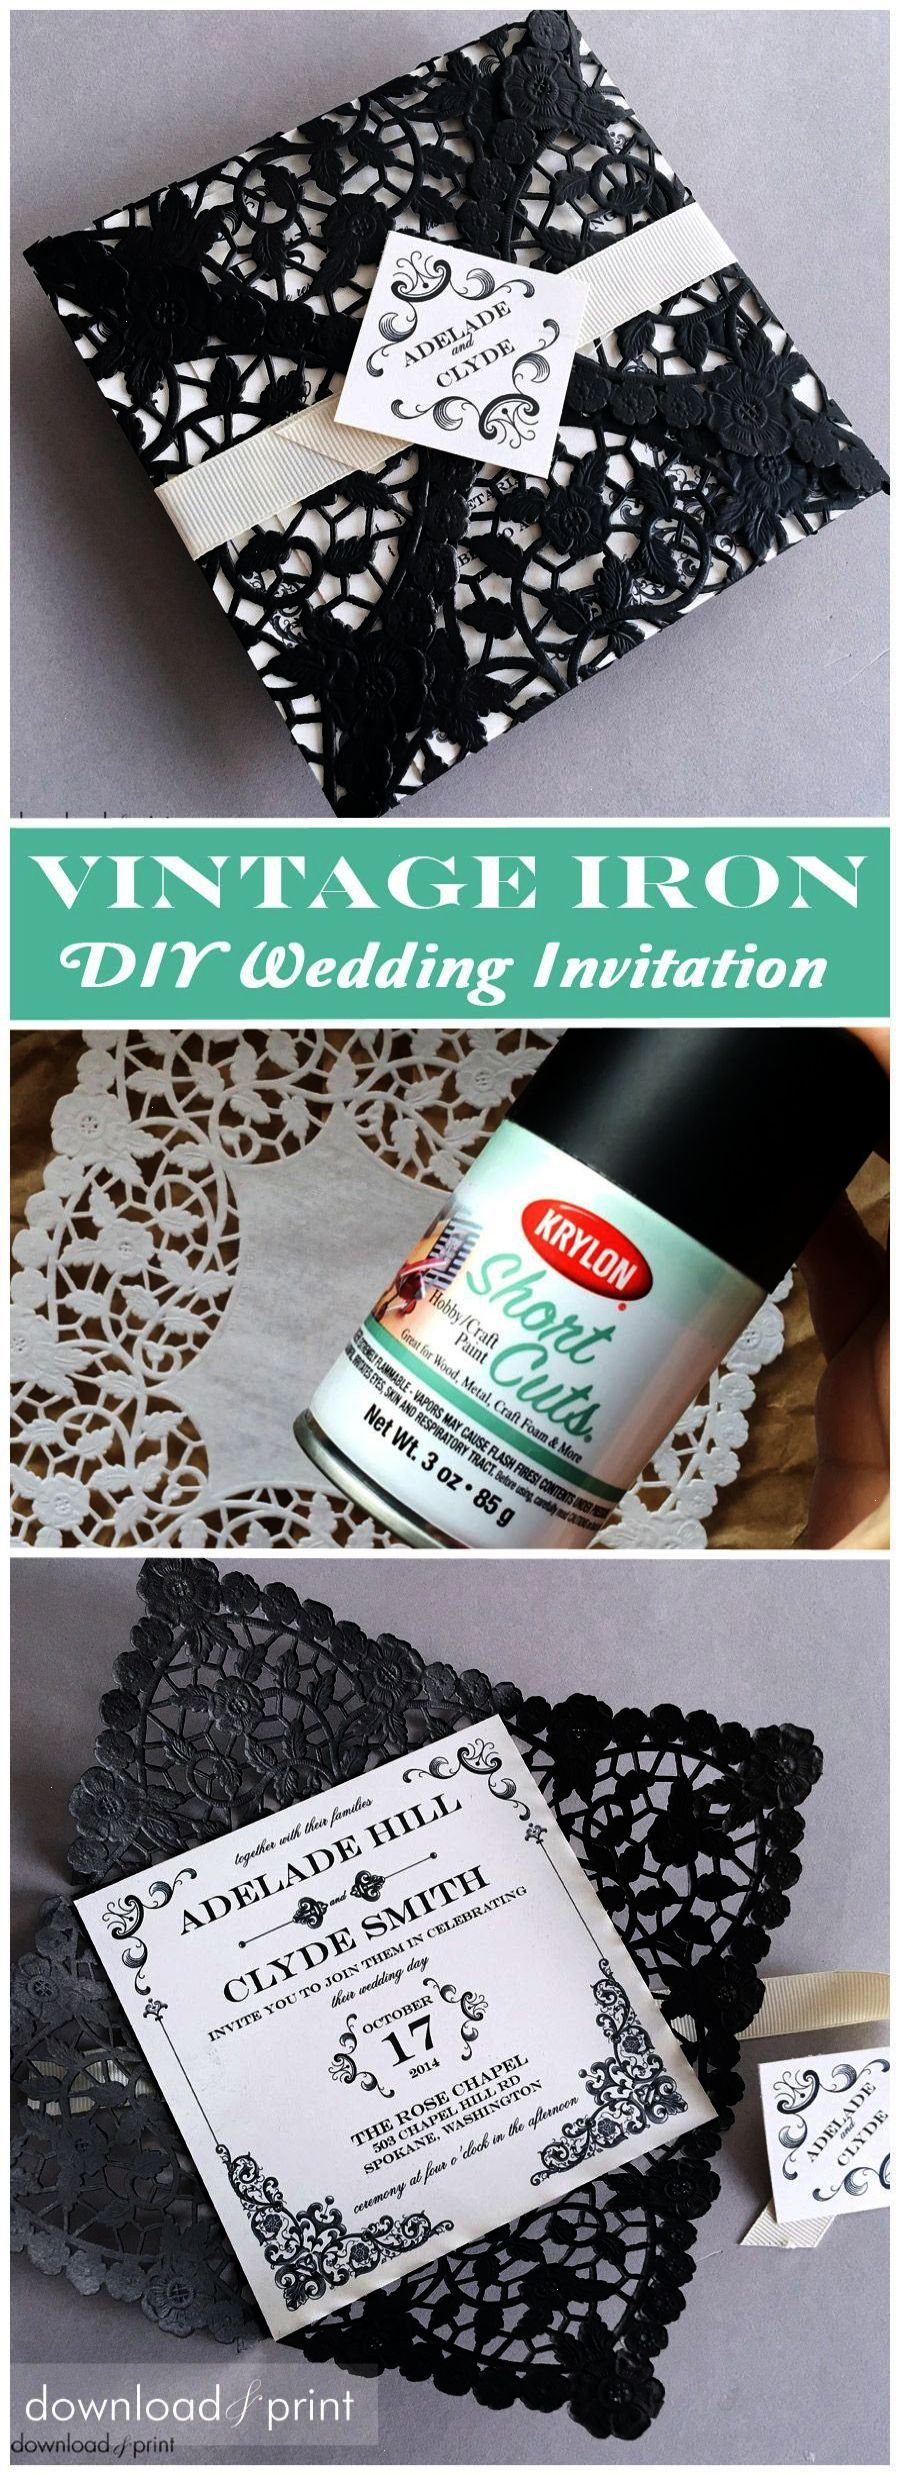 Wedding ideas diy vintage iron wedding invitation wedding